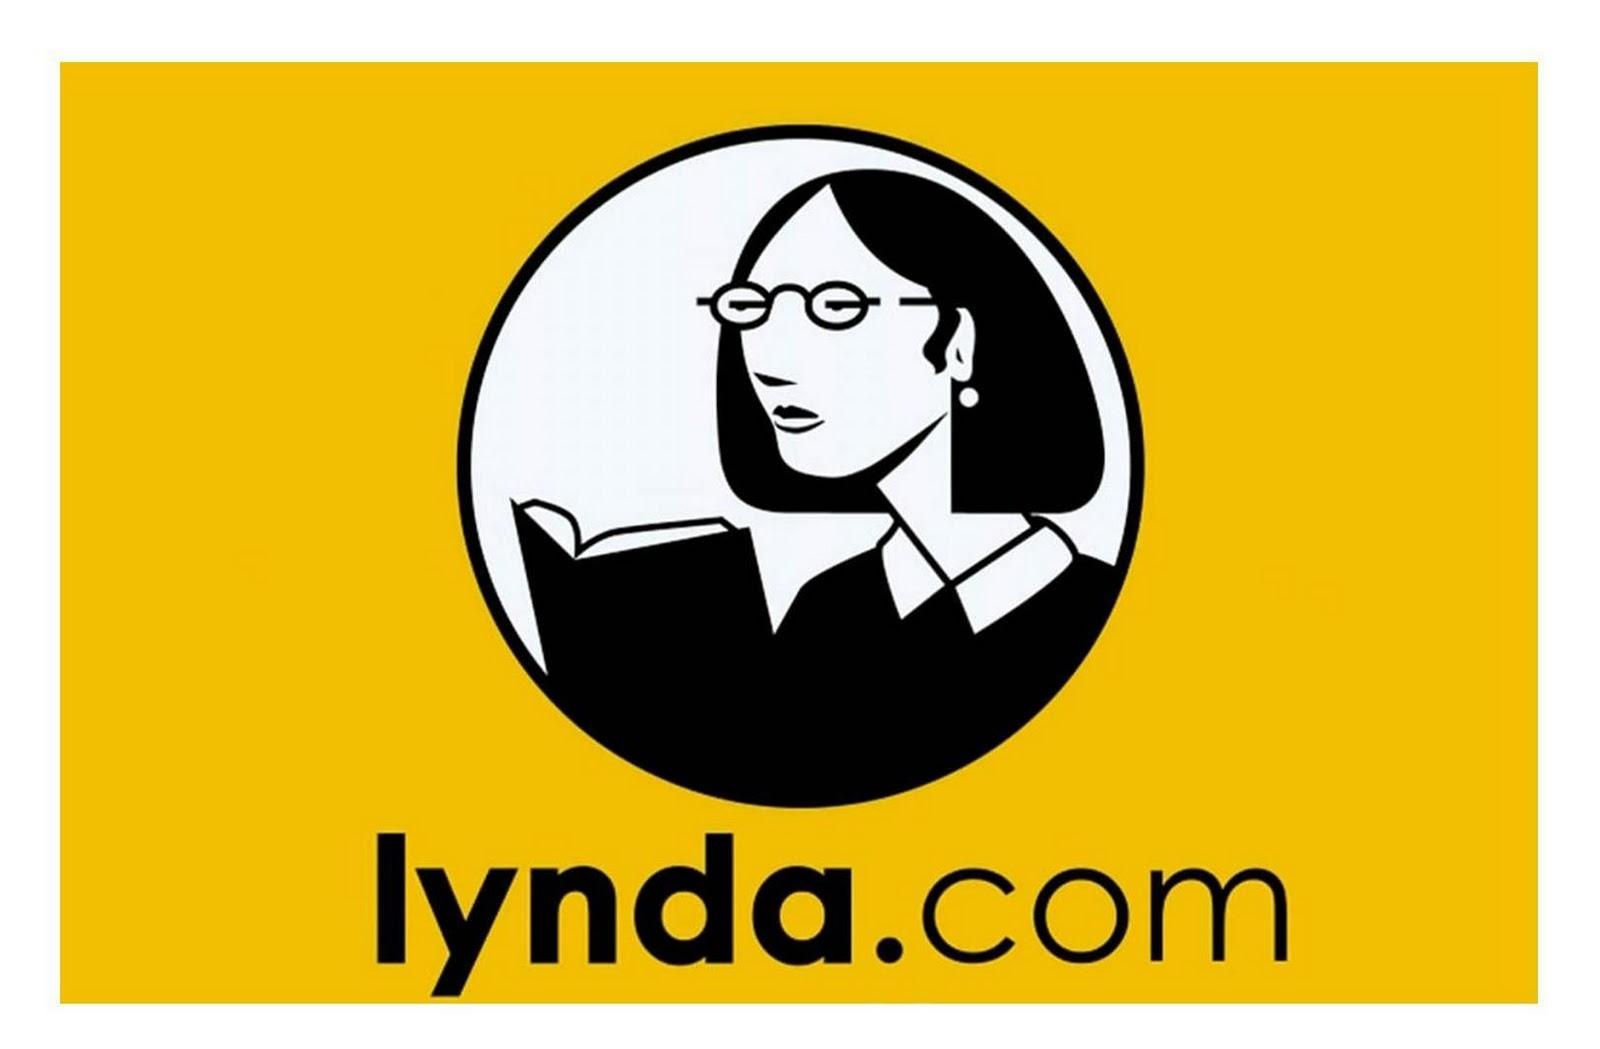 Woman reading a book - Lynda.com logo